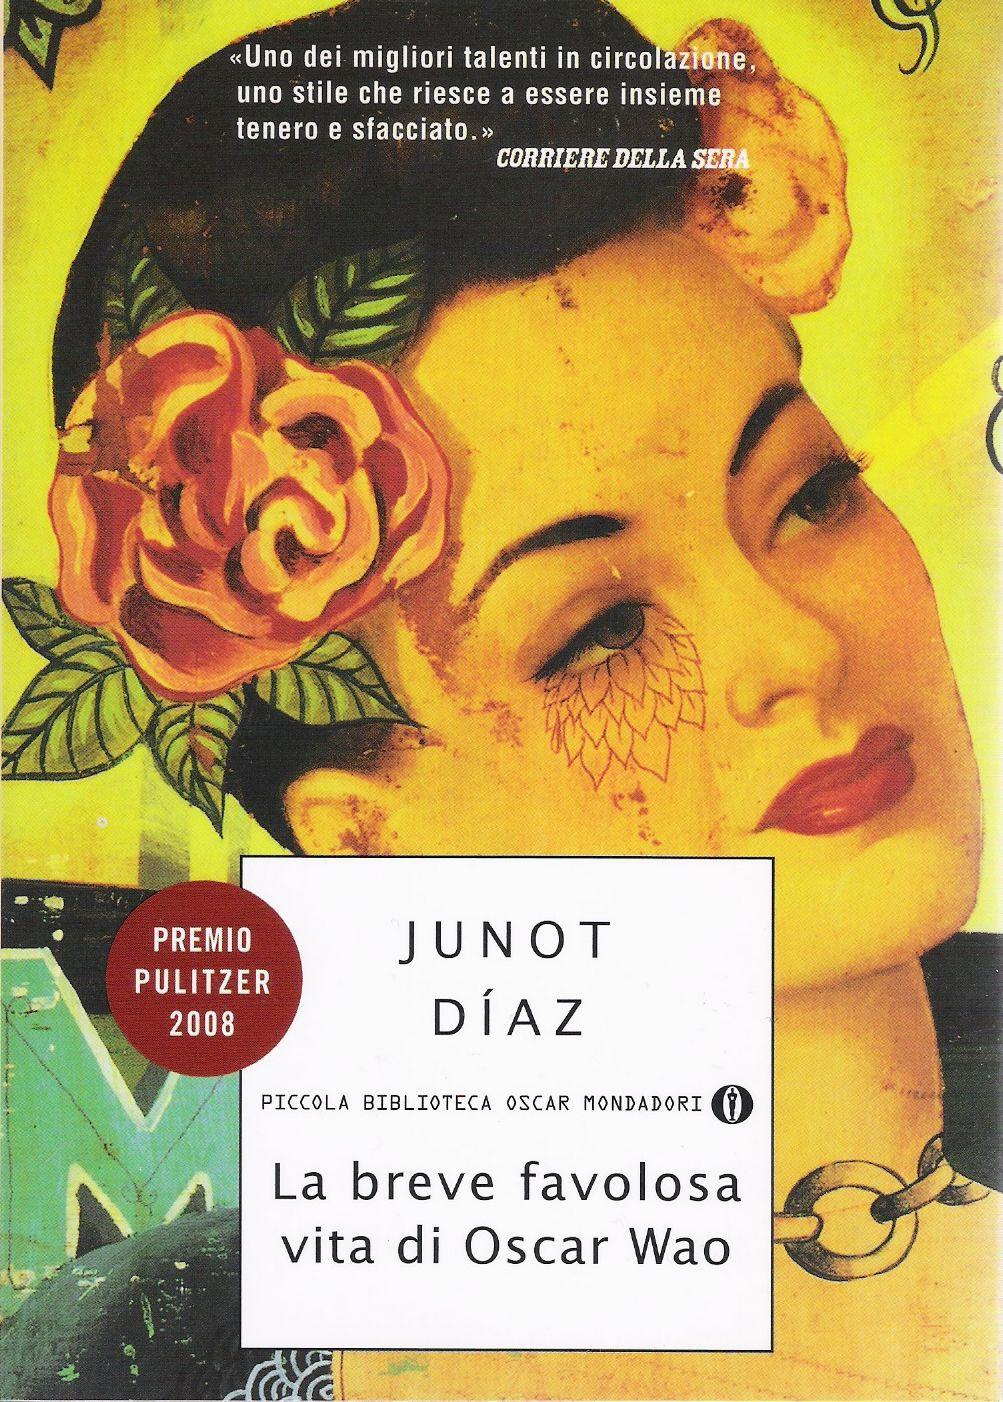 La breve favolosa vita di Oscar Wao di Junot Díaz